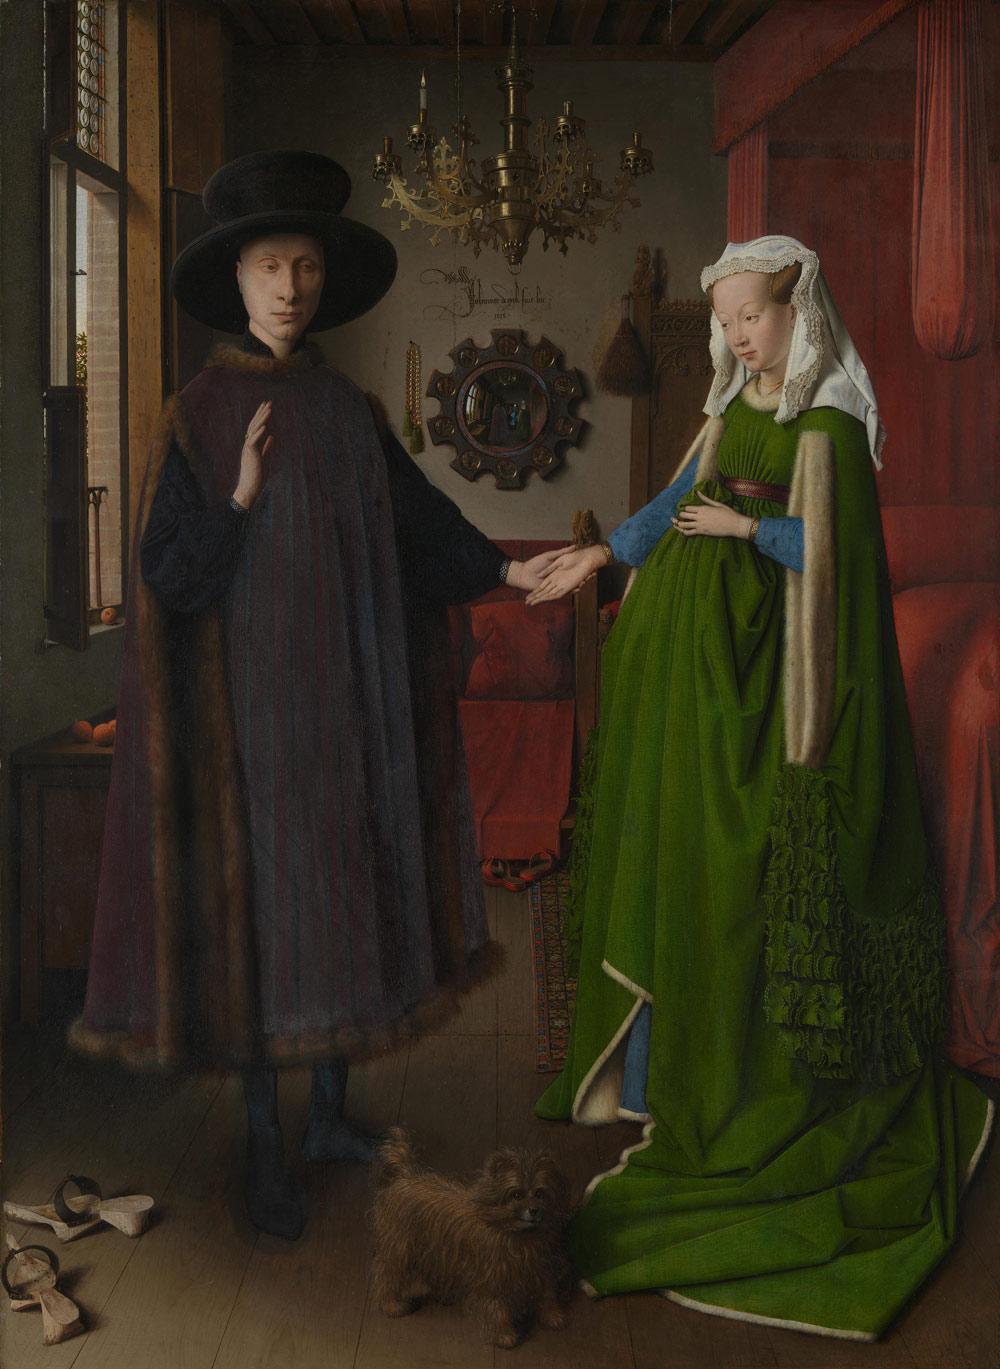 Jan van Eyck, Ritratto dei coniugi Arnolfini